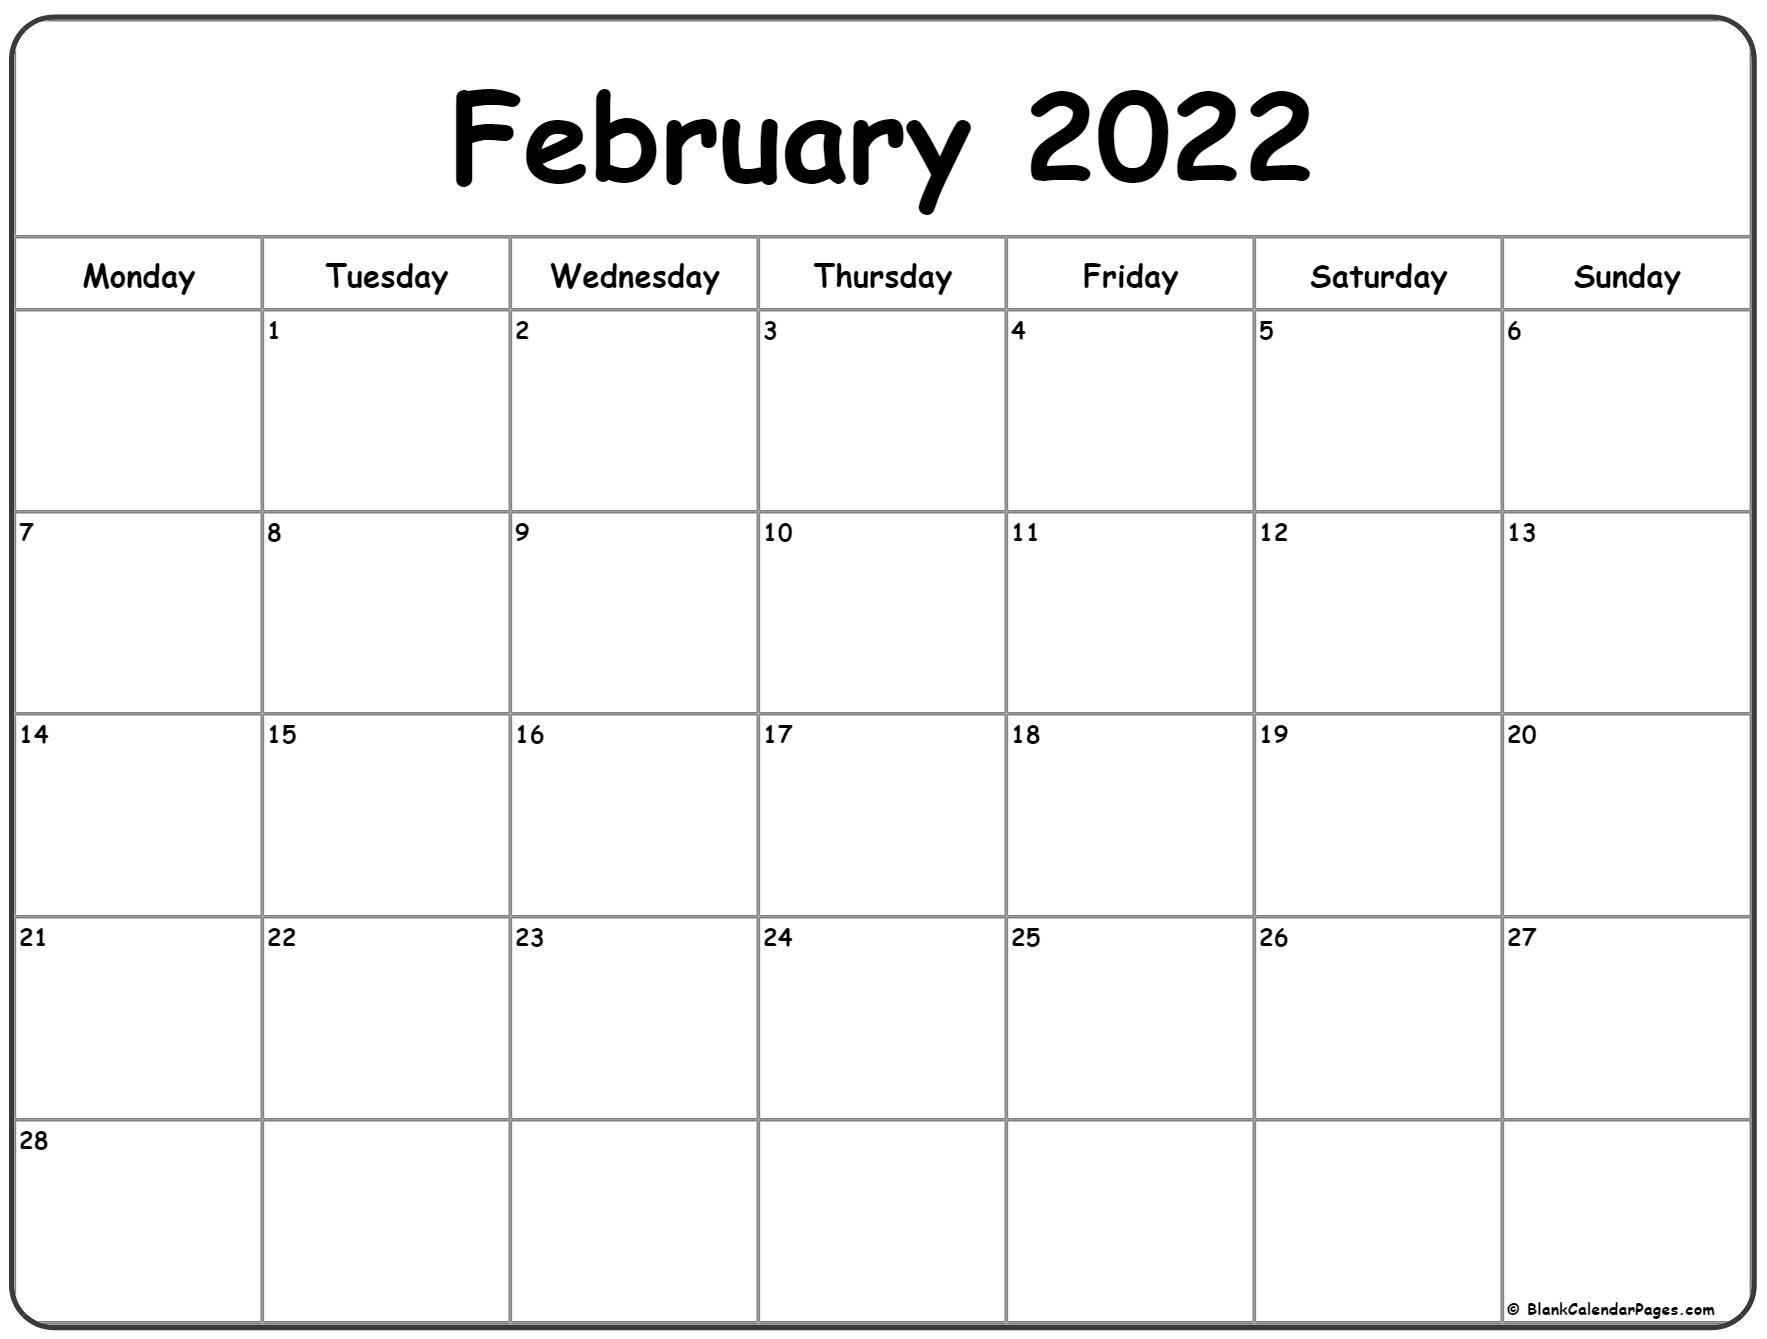 February 2022 Monday Calendar   Monday To Sunday